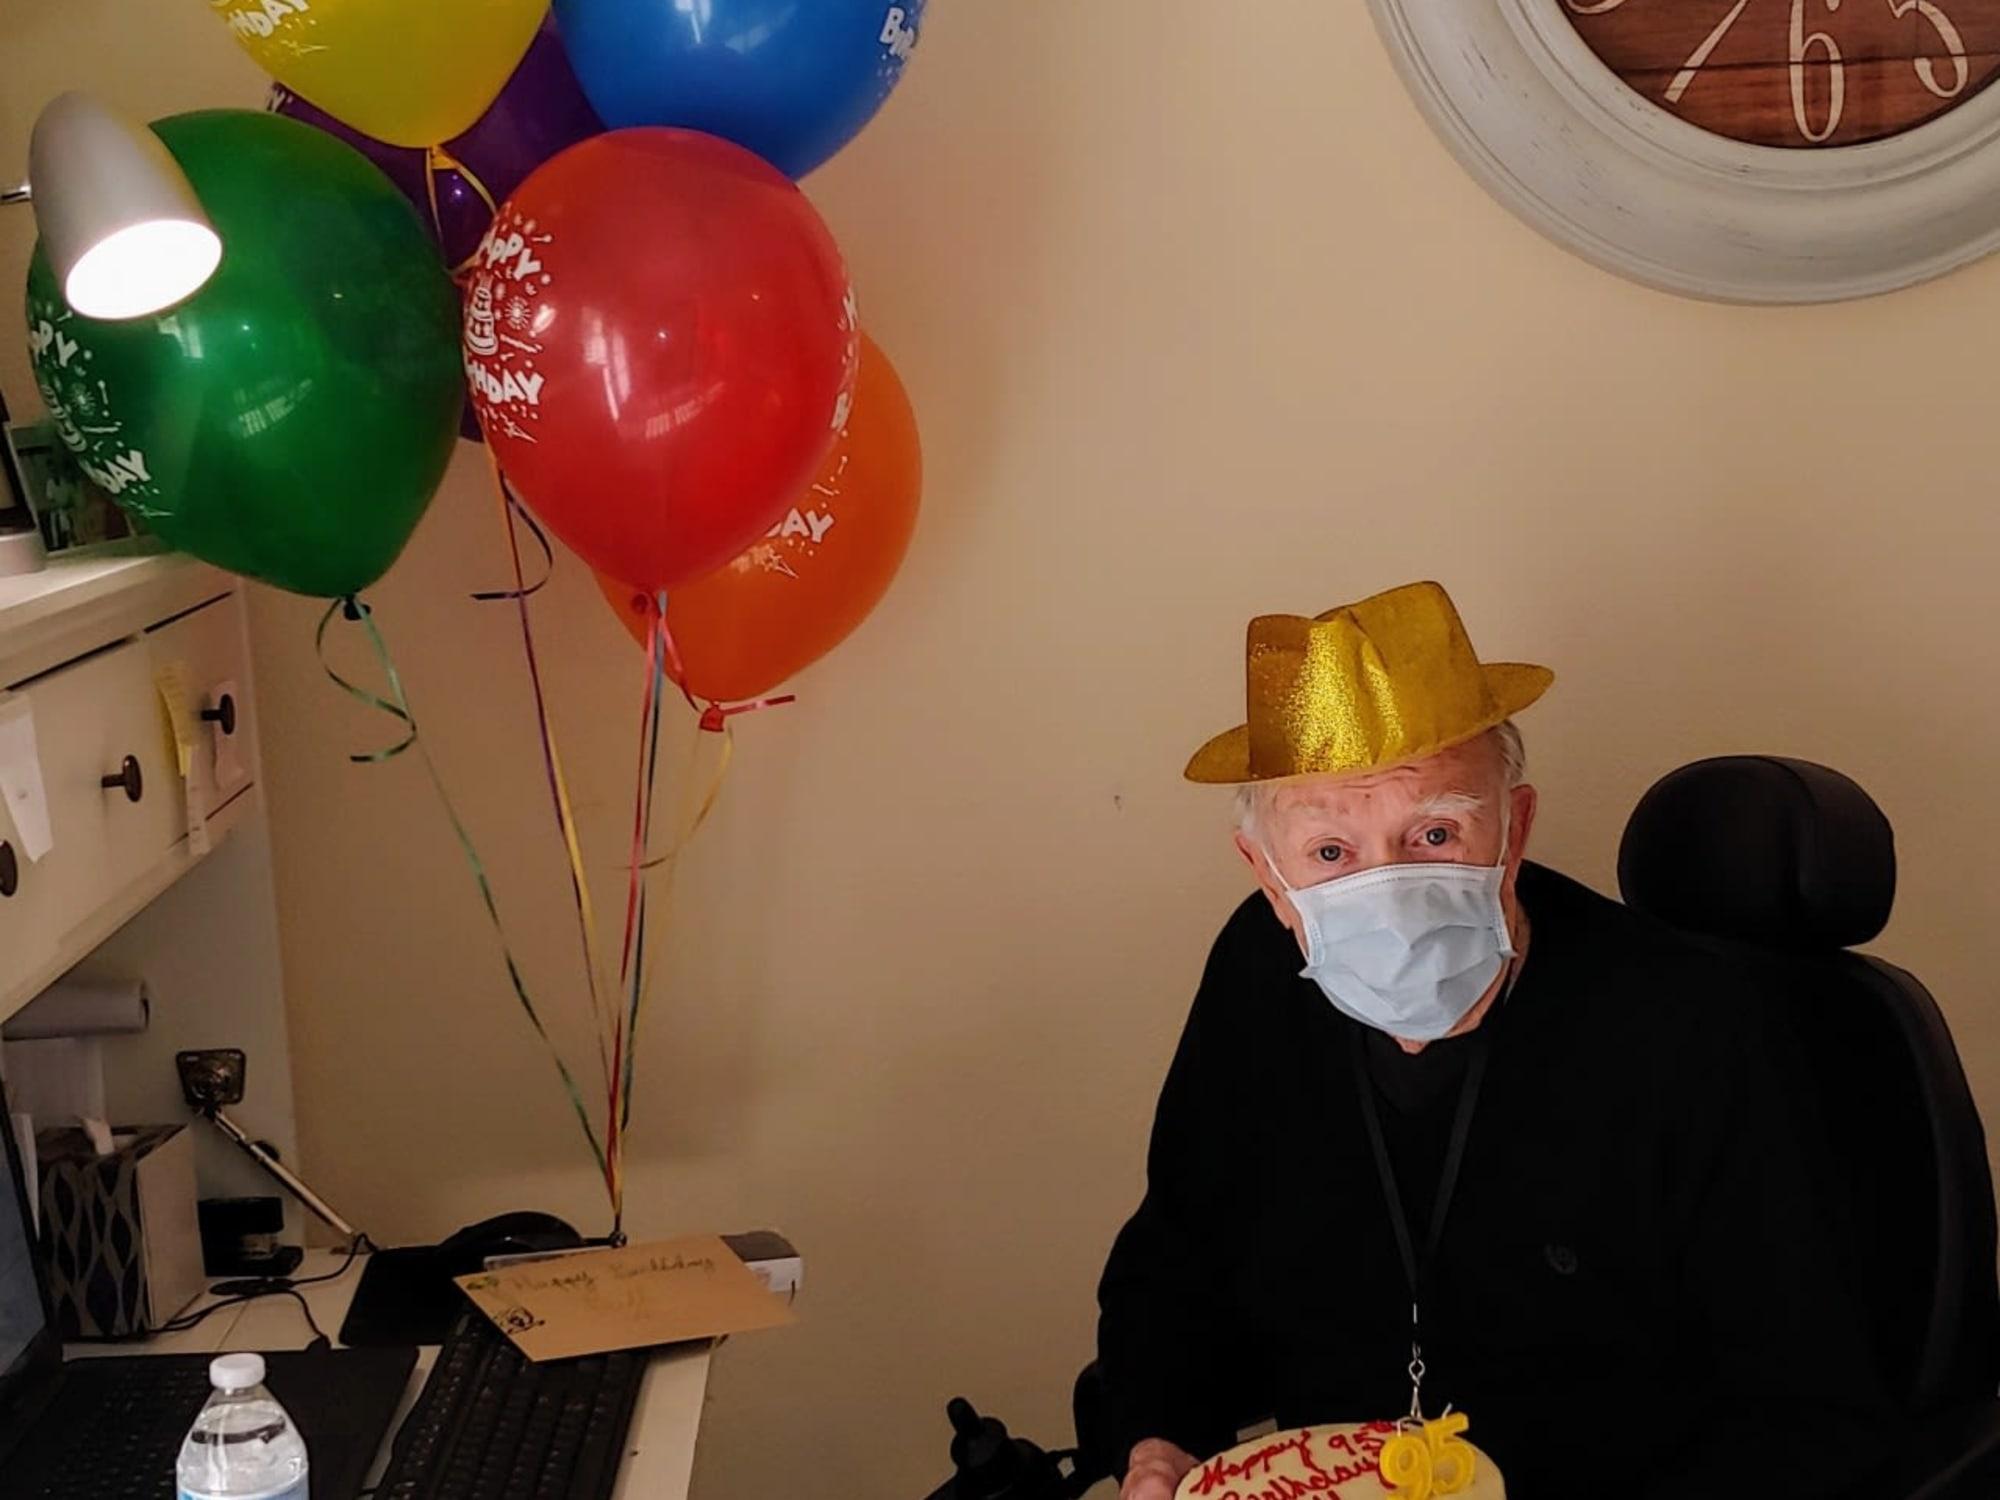 Birthday party at The Wellington in Salt Lake City, Utah